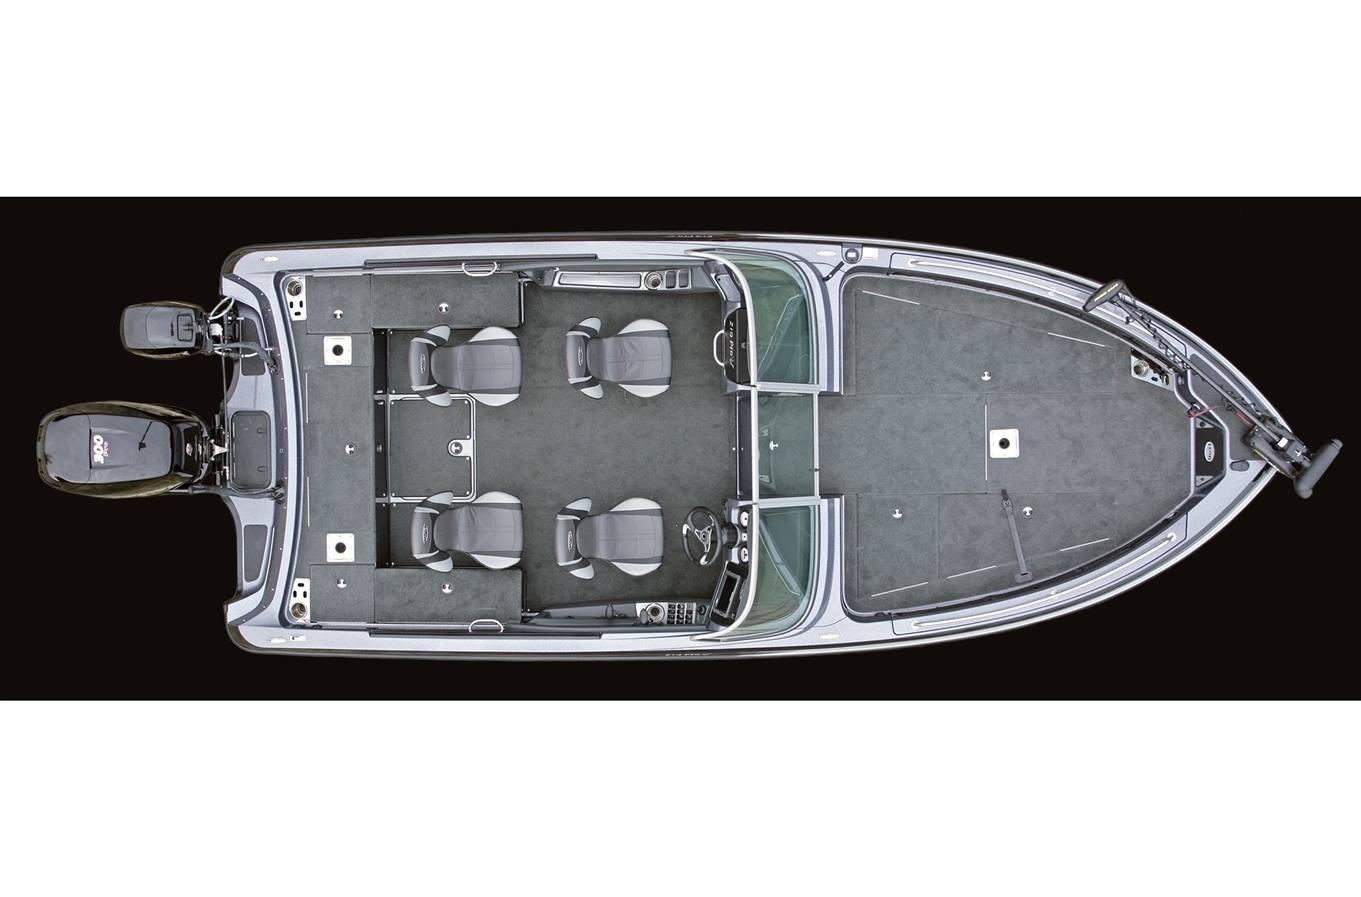 2019 Lund 202 Pro V Gl For Sale In Ham Lake Mn Rapid Marine